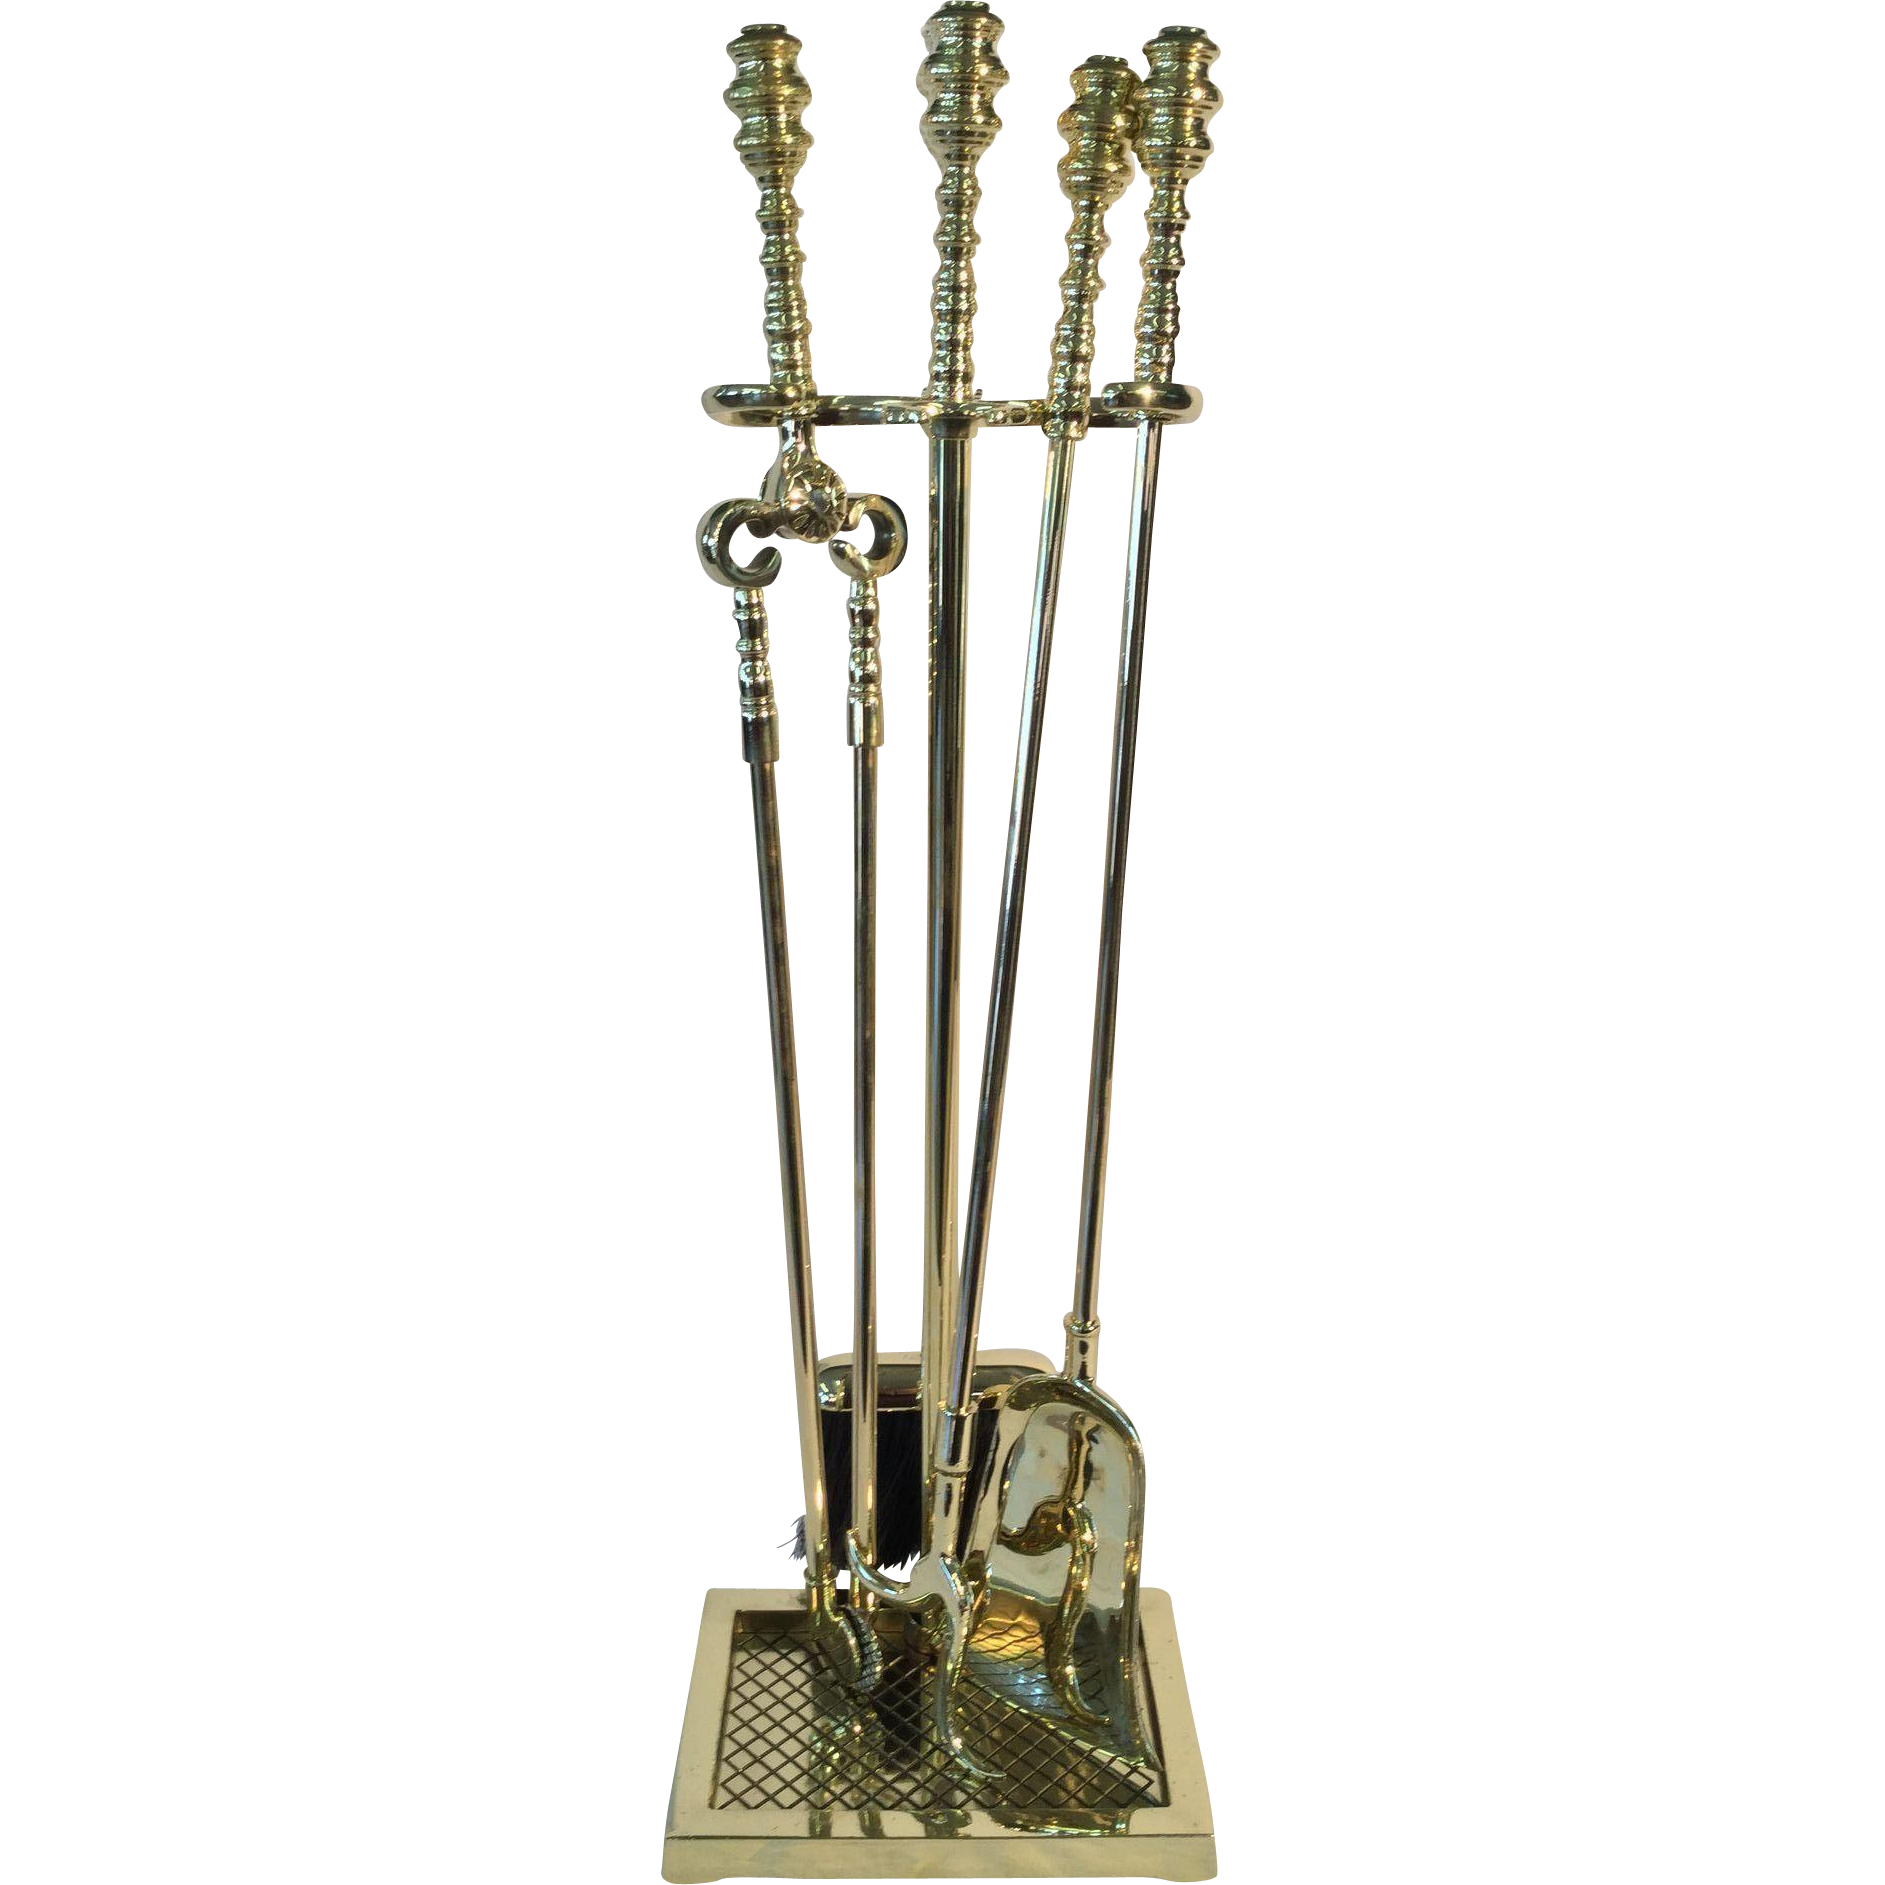 Fireplace tool set beehive handles